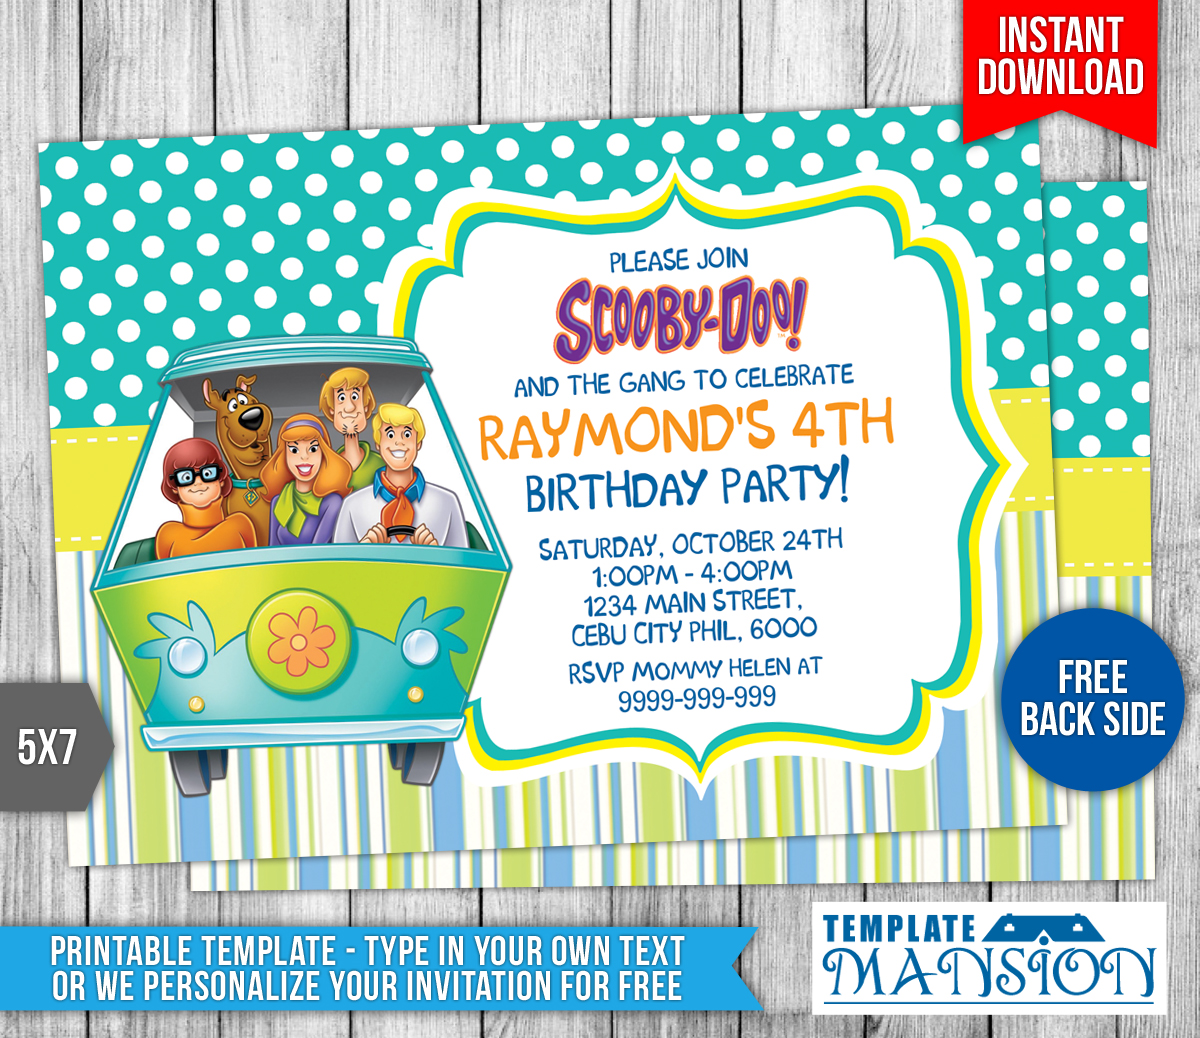 Scooby Doo Invitation Download Free – orderecigsjuice.info